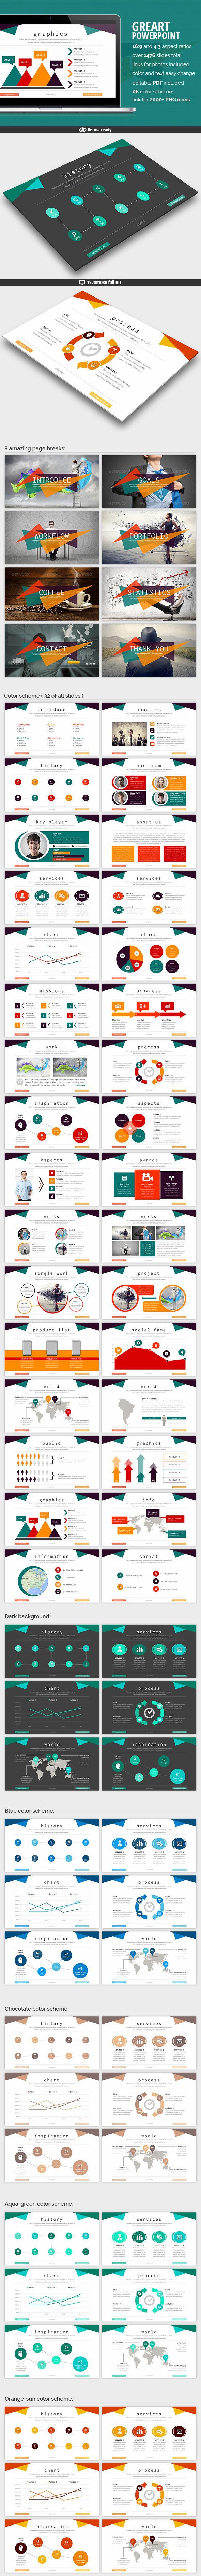 Greart - Powerpoint Presentation PowerPoint Template / Theme / Presentation / Slides / Background / Power Point #powerpoint #template #theme